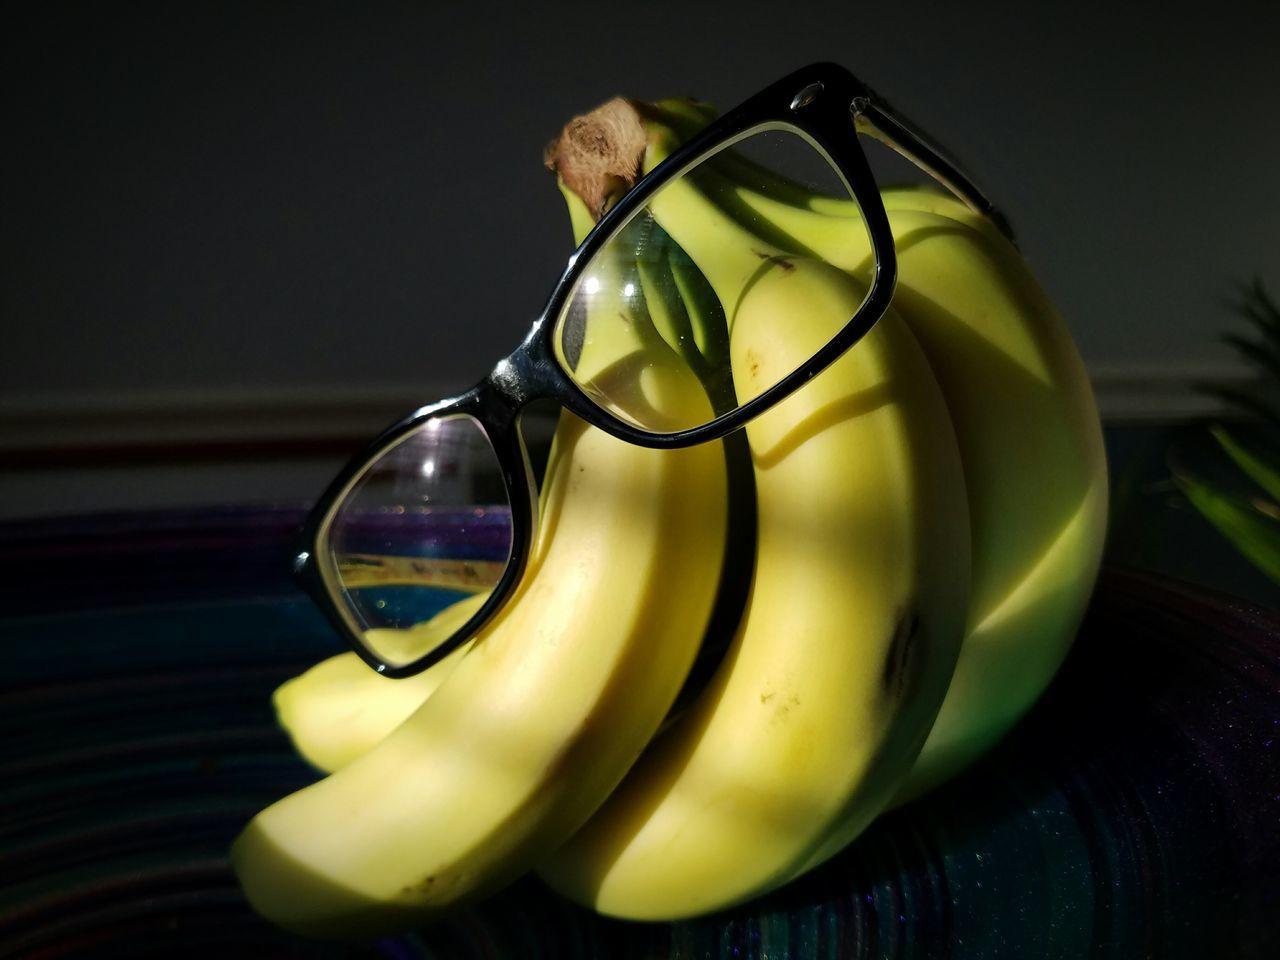 Iseebananas Banana Fruit Nerd Glasses  Dork Fruit Natural Light GalaxyS7Edge Galaxy Camera